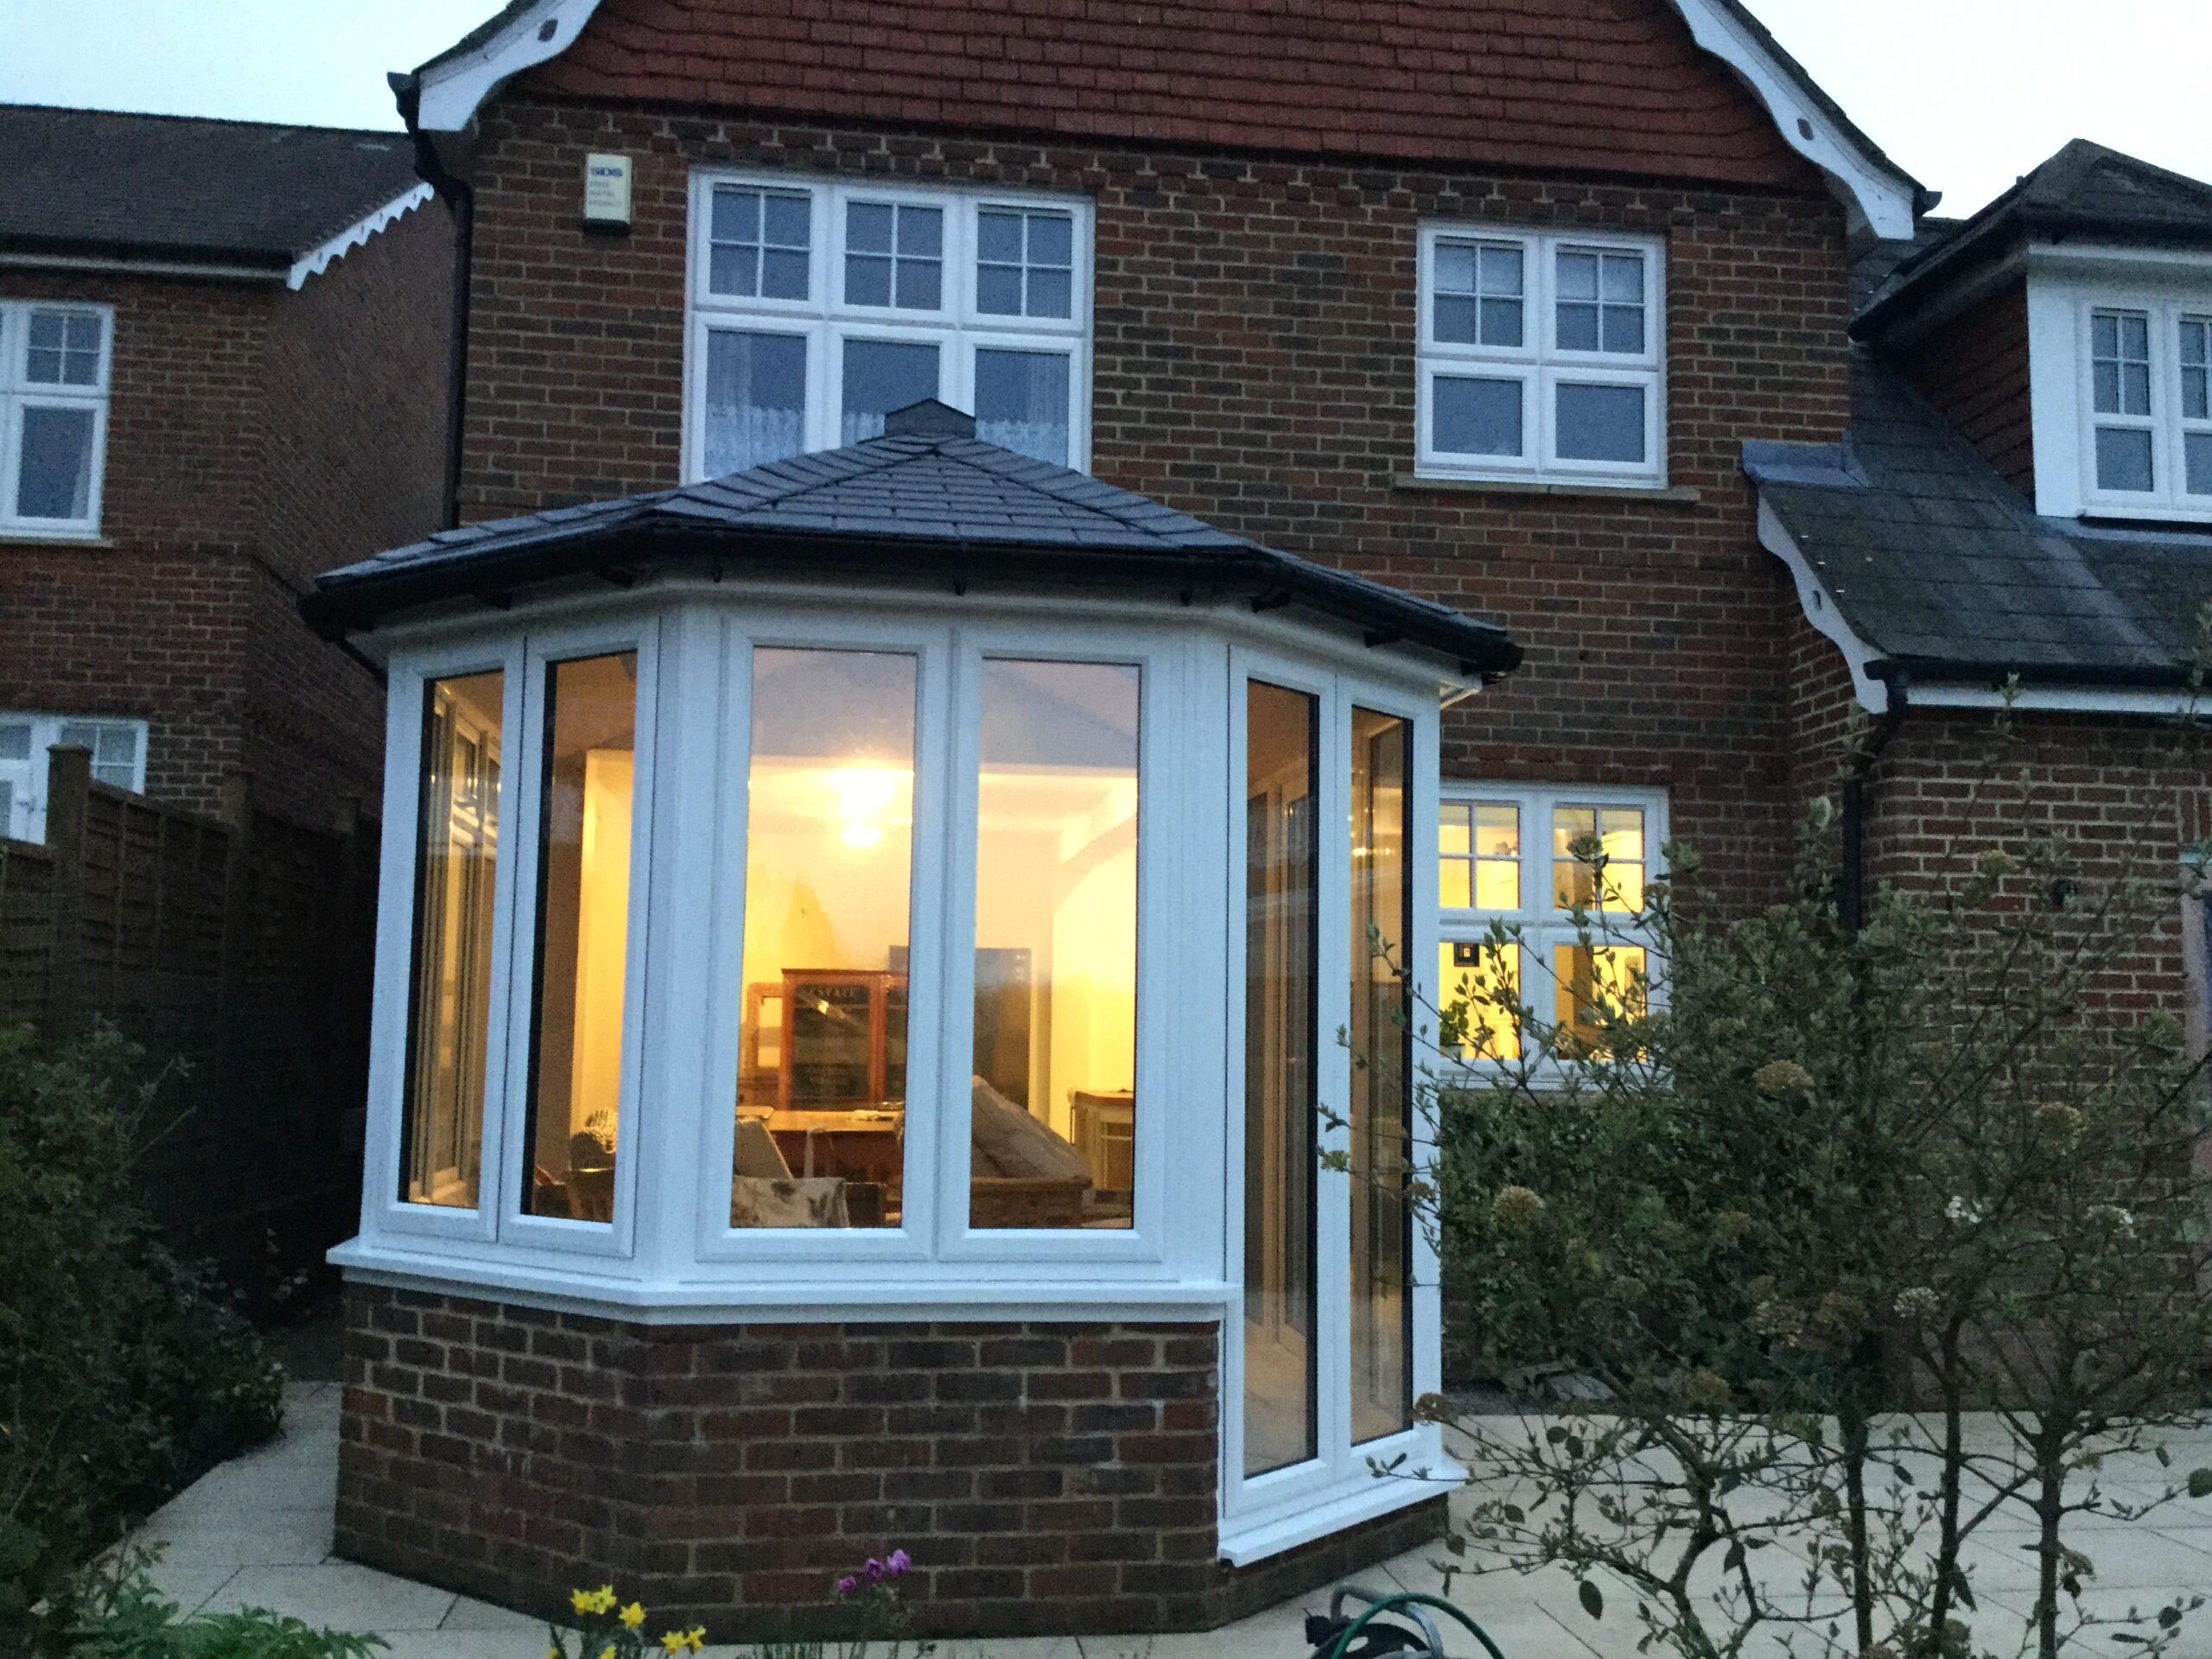 Triple Glazing Windows and Conservatory